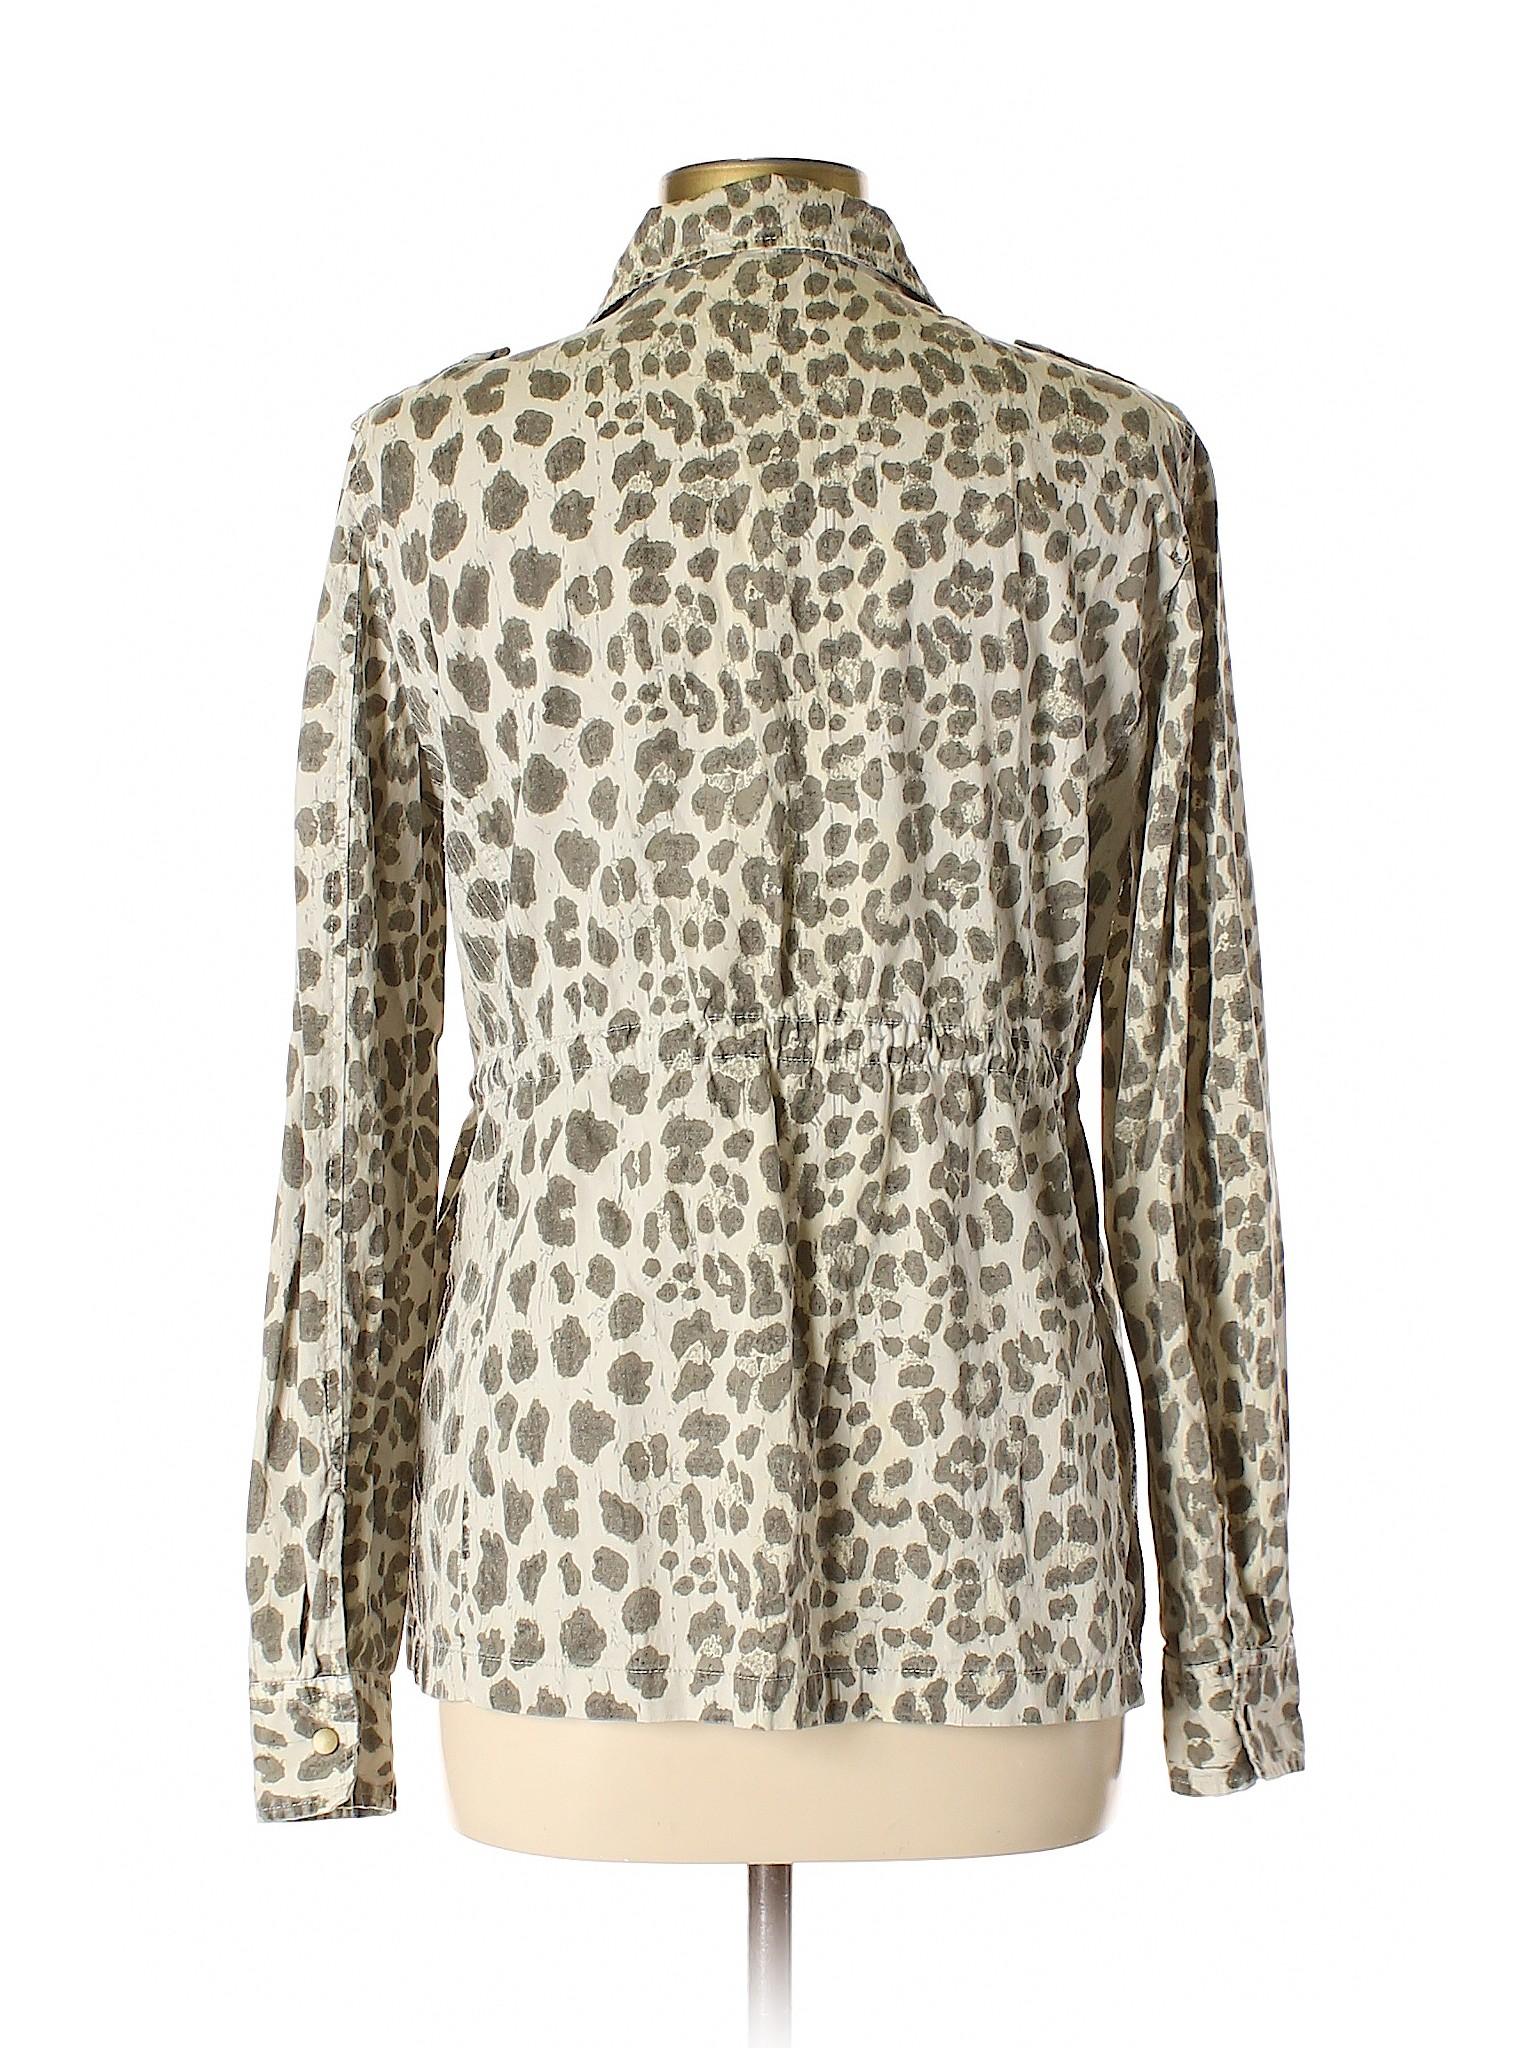 Jacket Lily Aldridge leisure for Boutique Velvet cHqOvpy